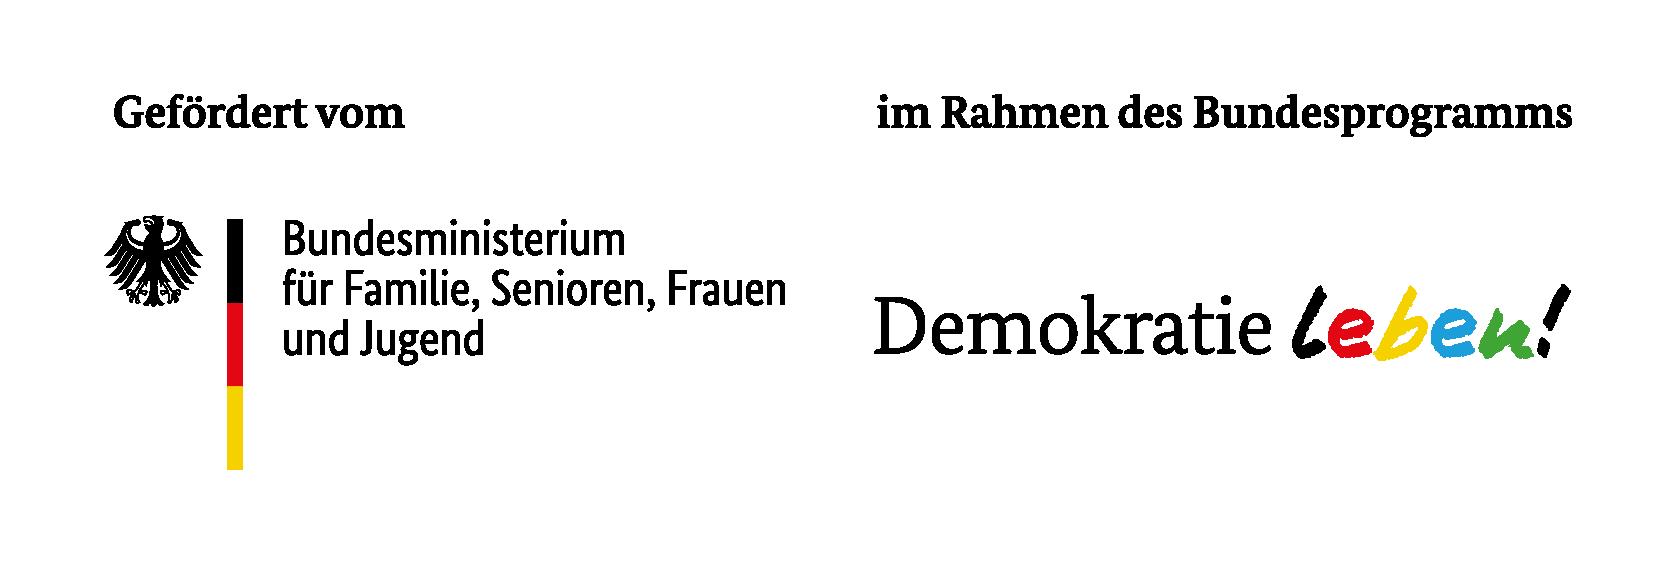 Logo_Demokratie leben